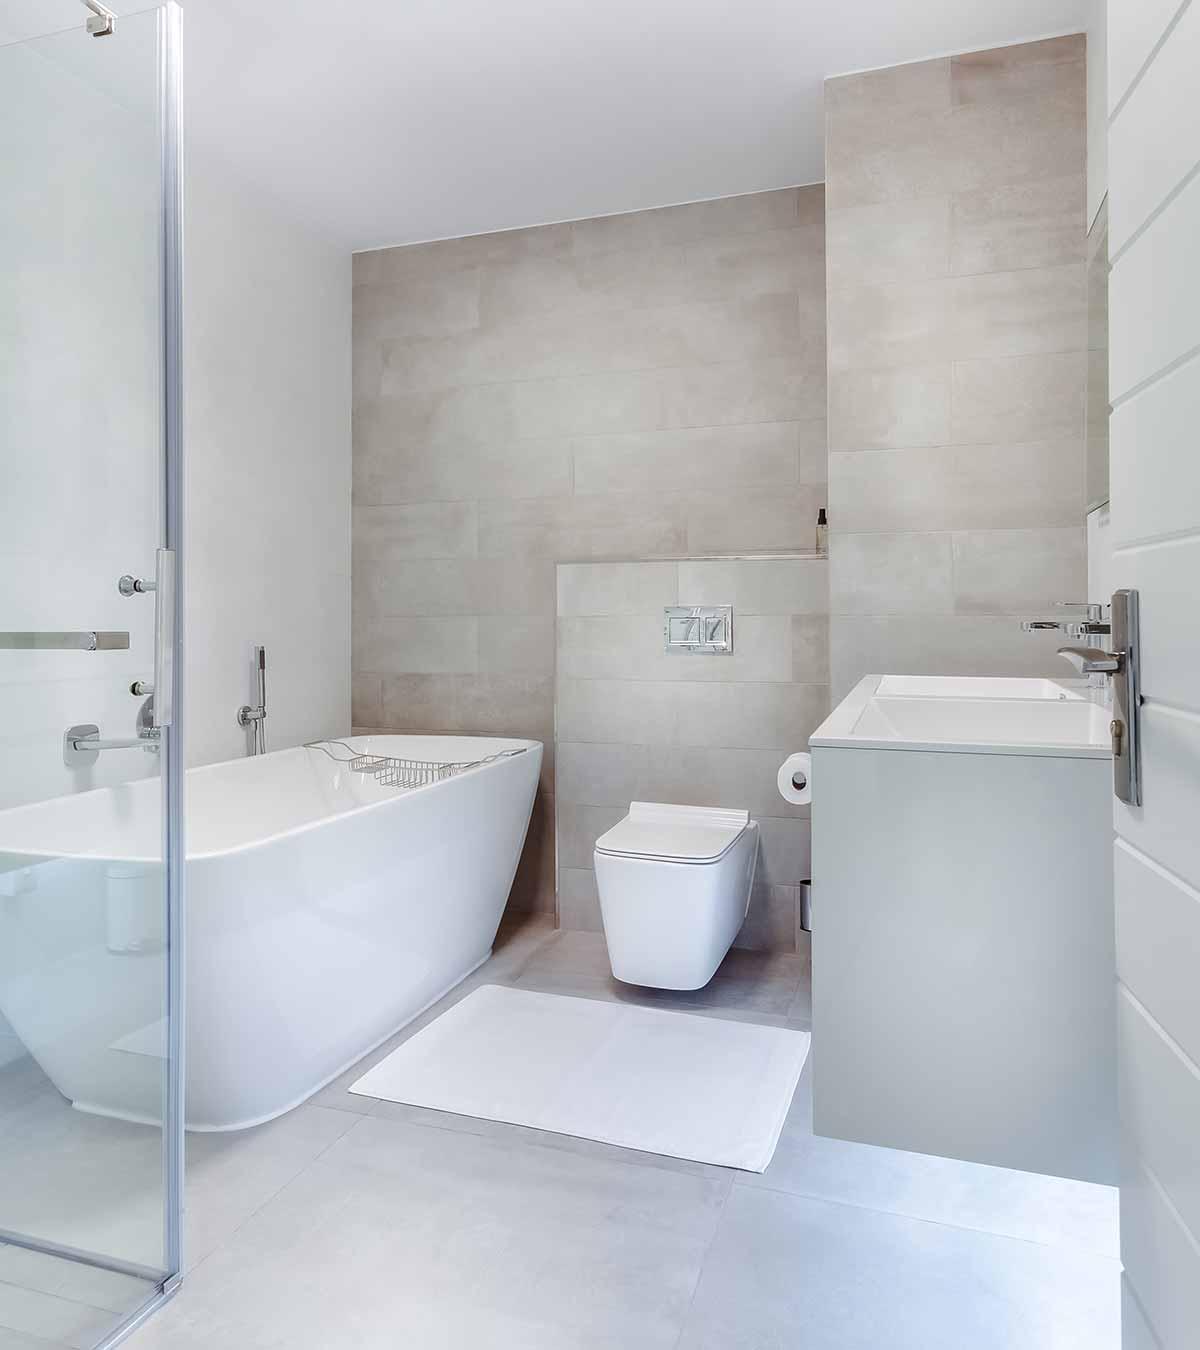 Rénovation salle de bain Lyon 6 : Cano Rénovation s\'occupe ...